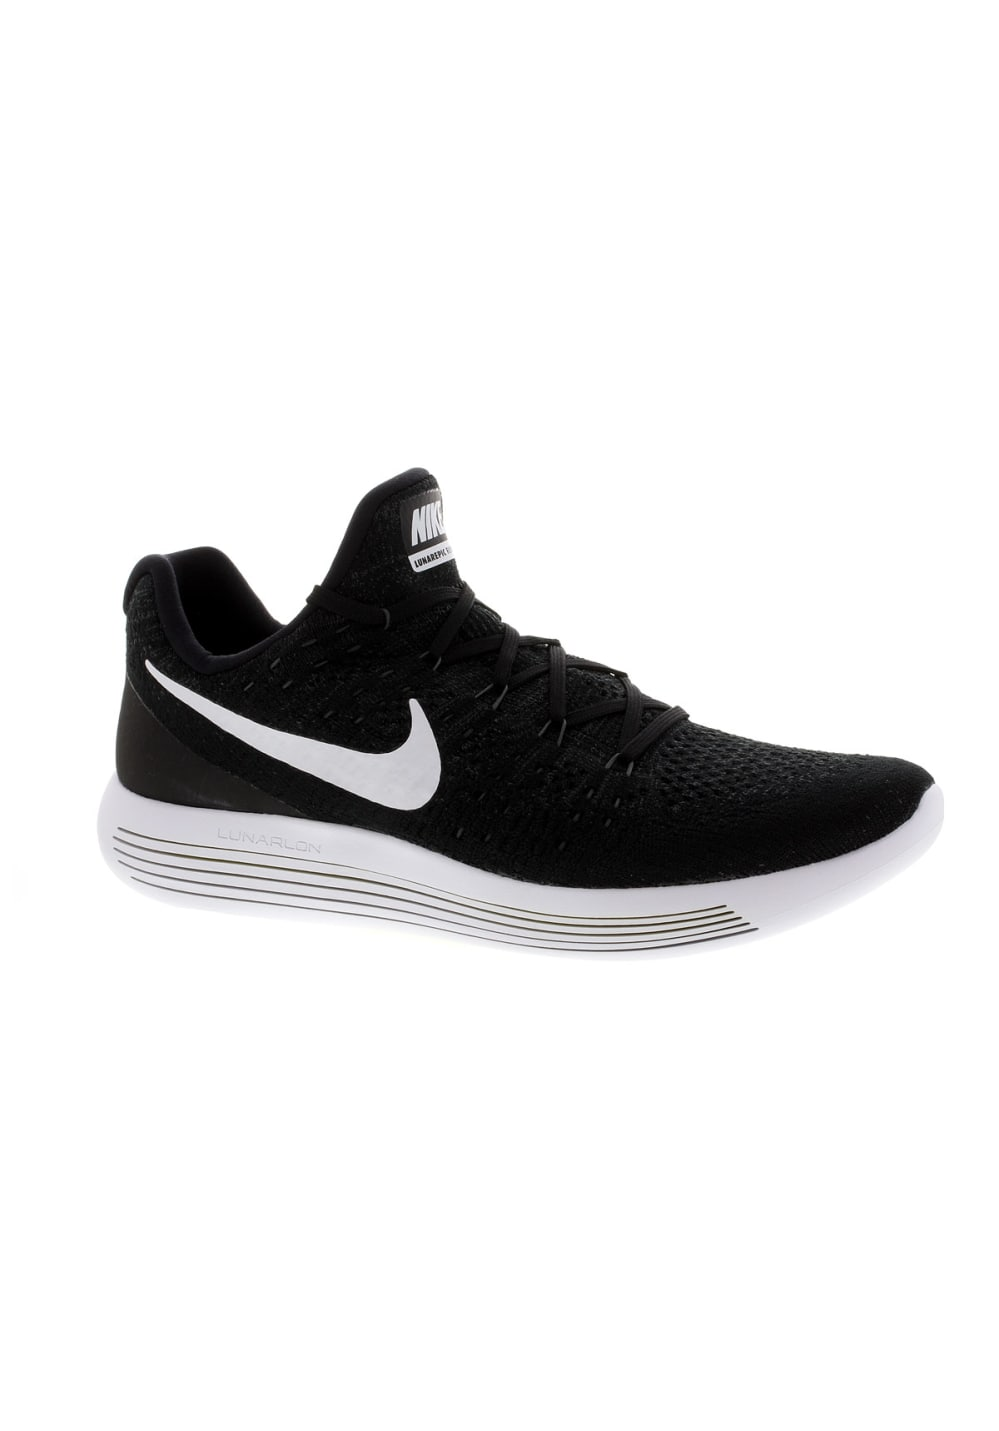 Zapatillas Nike Running España Nike Lunarepic Bajas